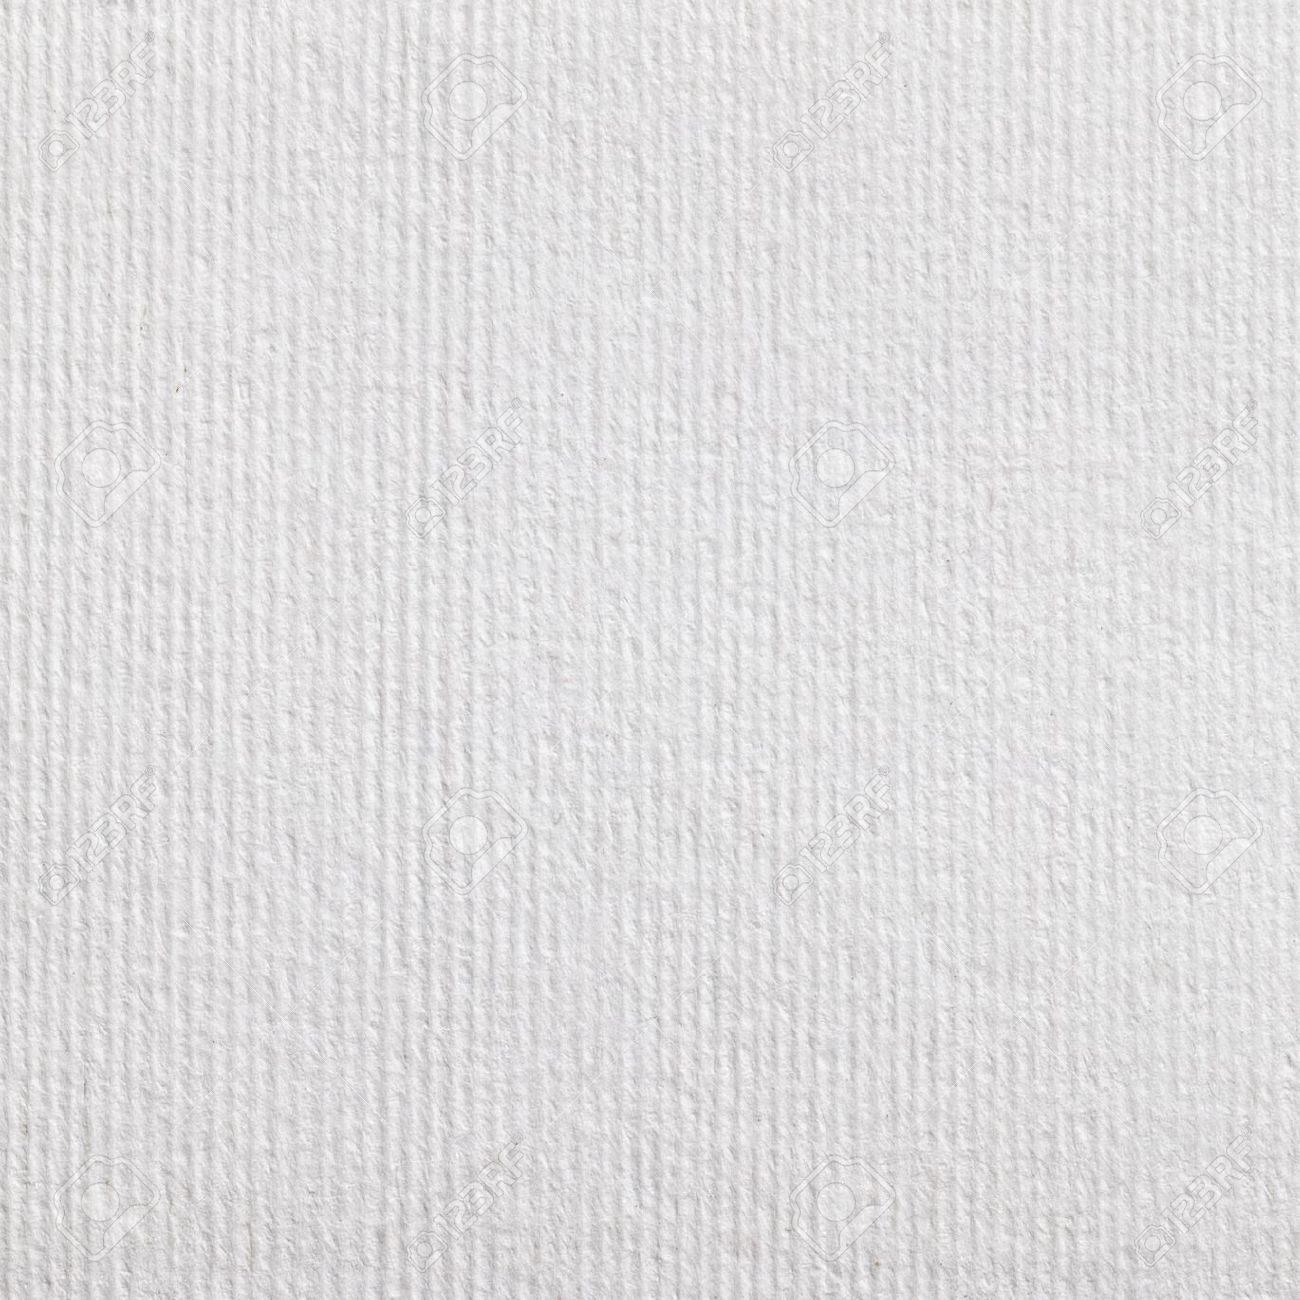 Art Paper Textured Background Stock Photo - 14607895